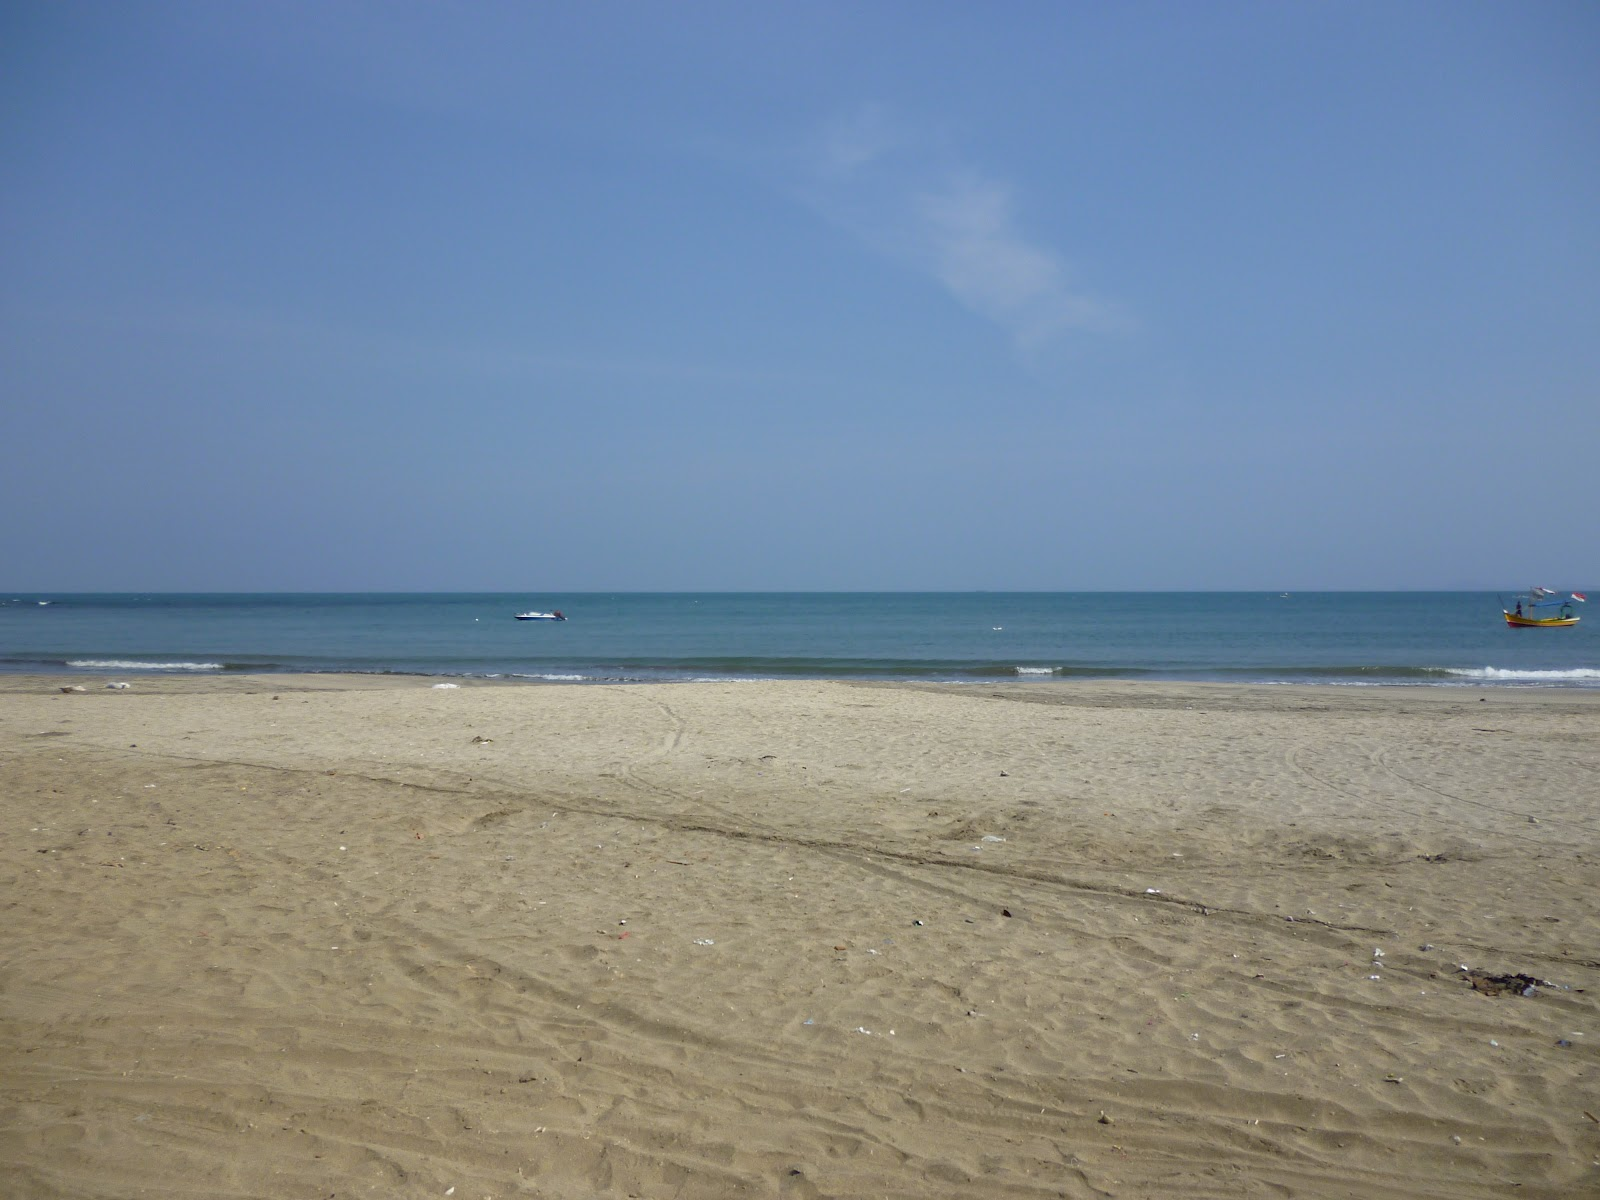 pantai berpasir